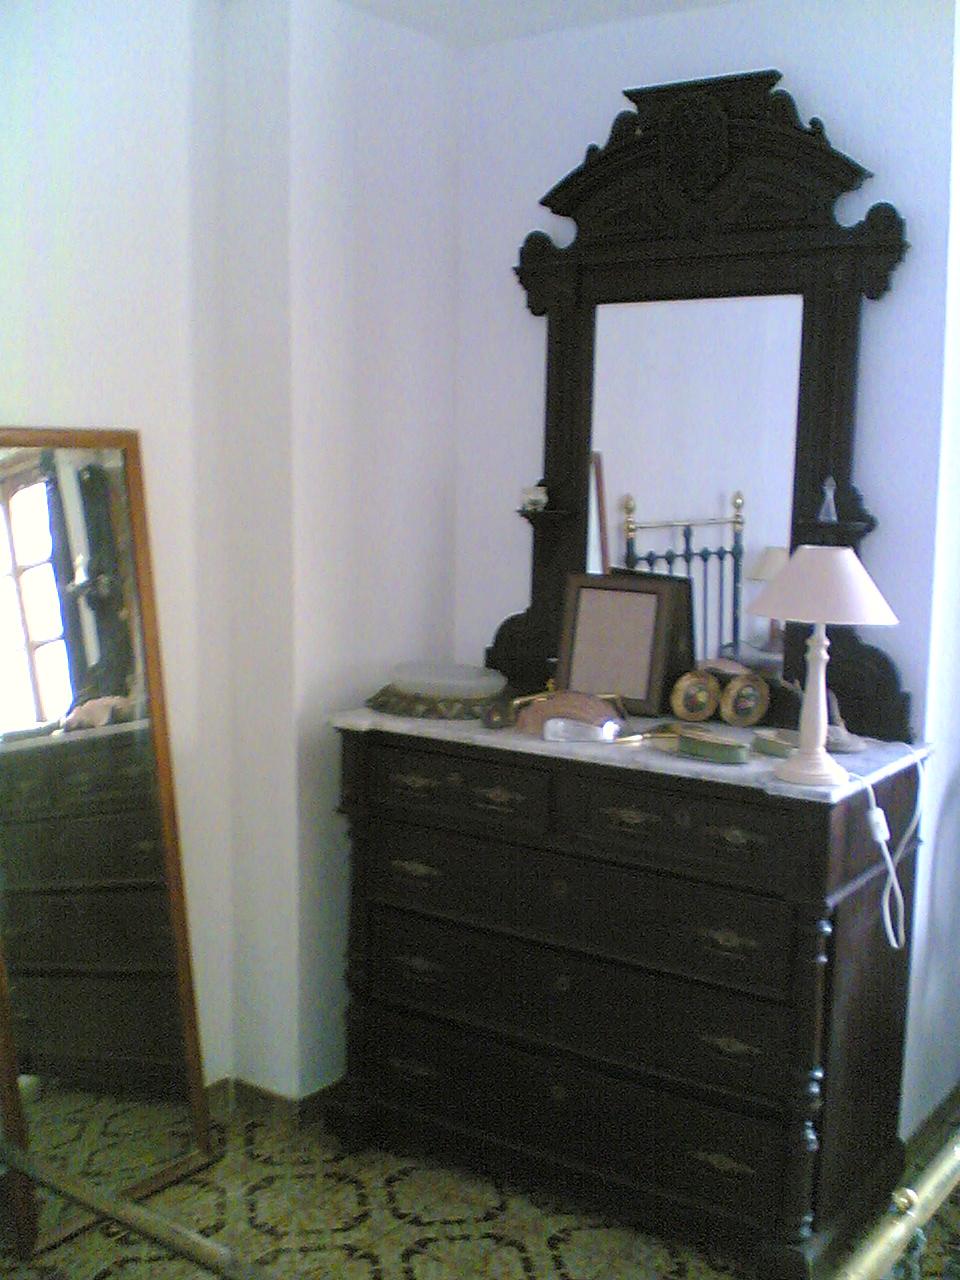 Rastrillo portobello venta por traslado estilo americano en el puerto de la cruz - La casa de mi tresillo ...